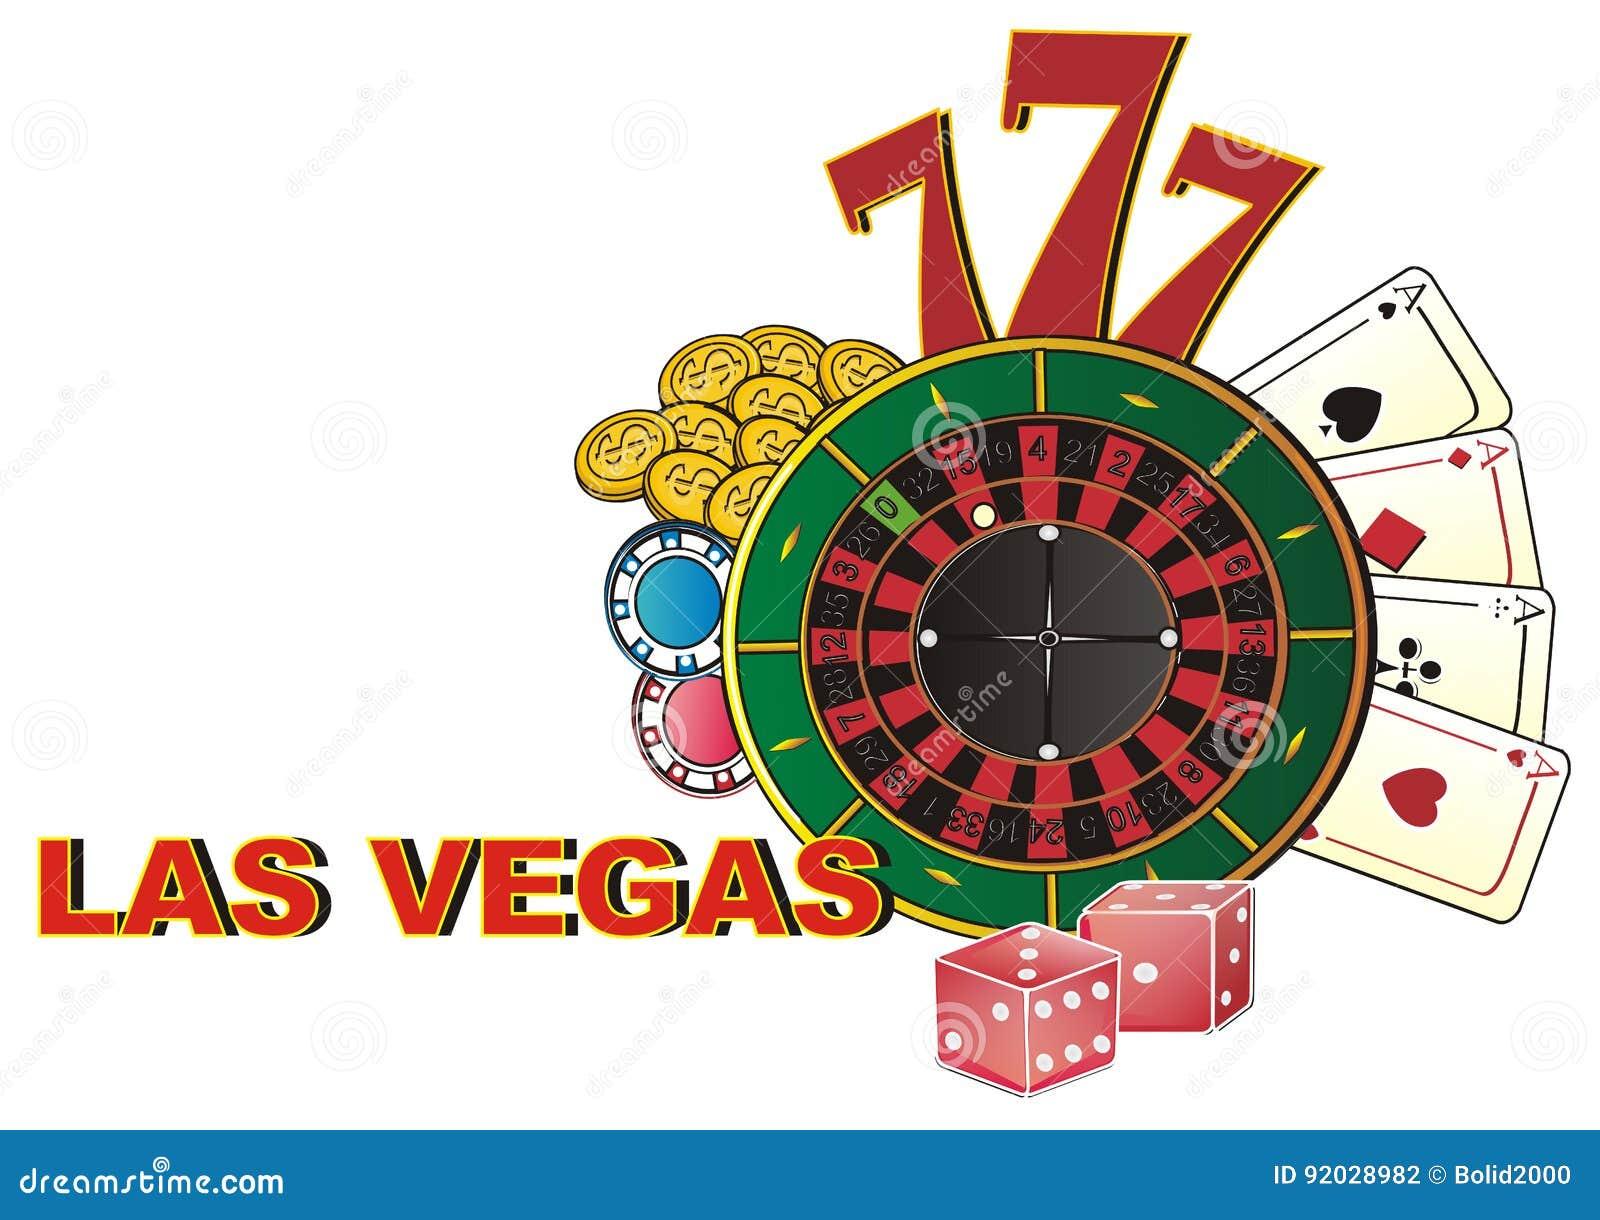 Las Vegas And Symbols Of It Stock Illustration Illustration Of